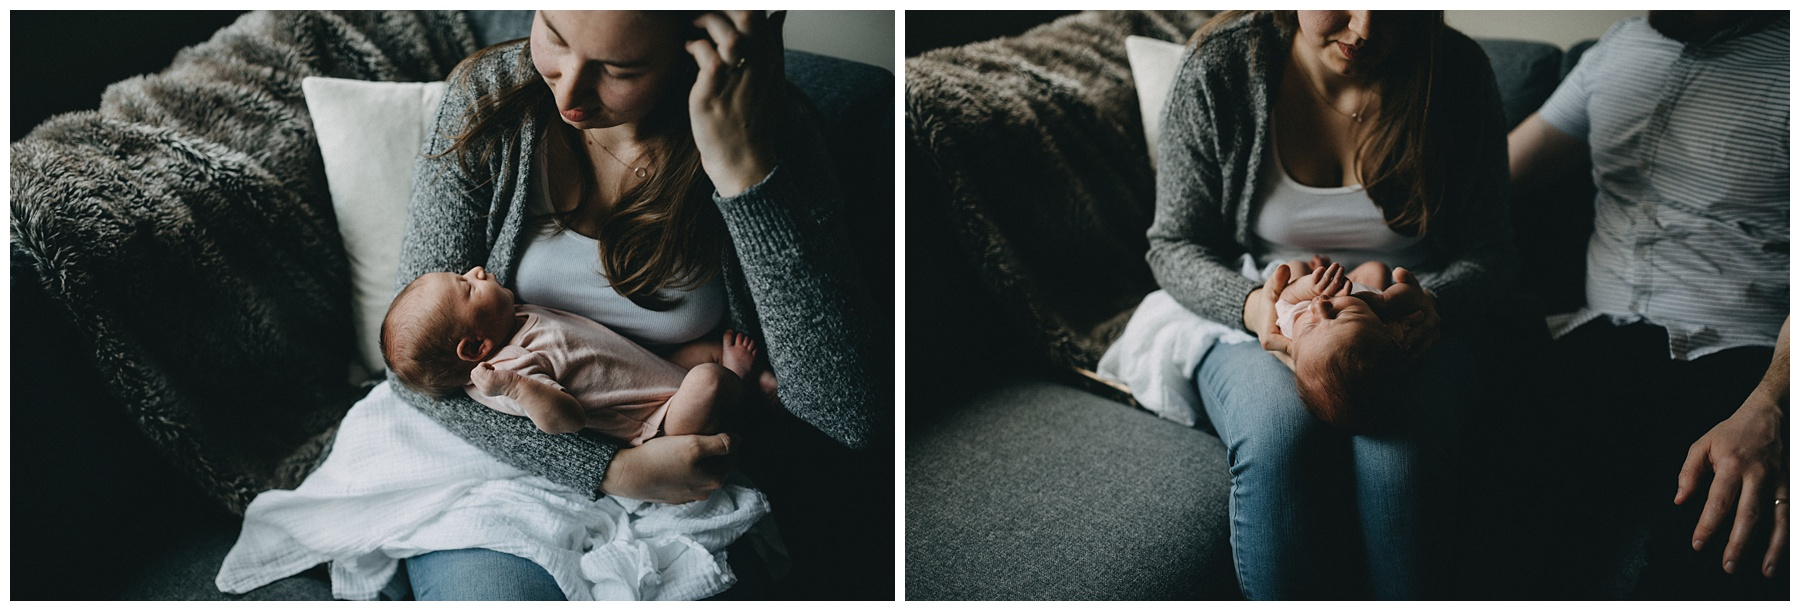 Vancouver newborn Baby photographer_0899.jpg